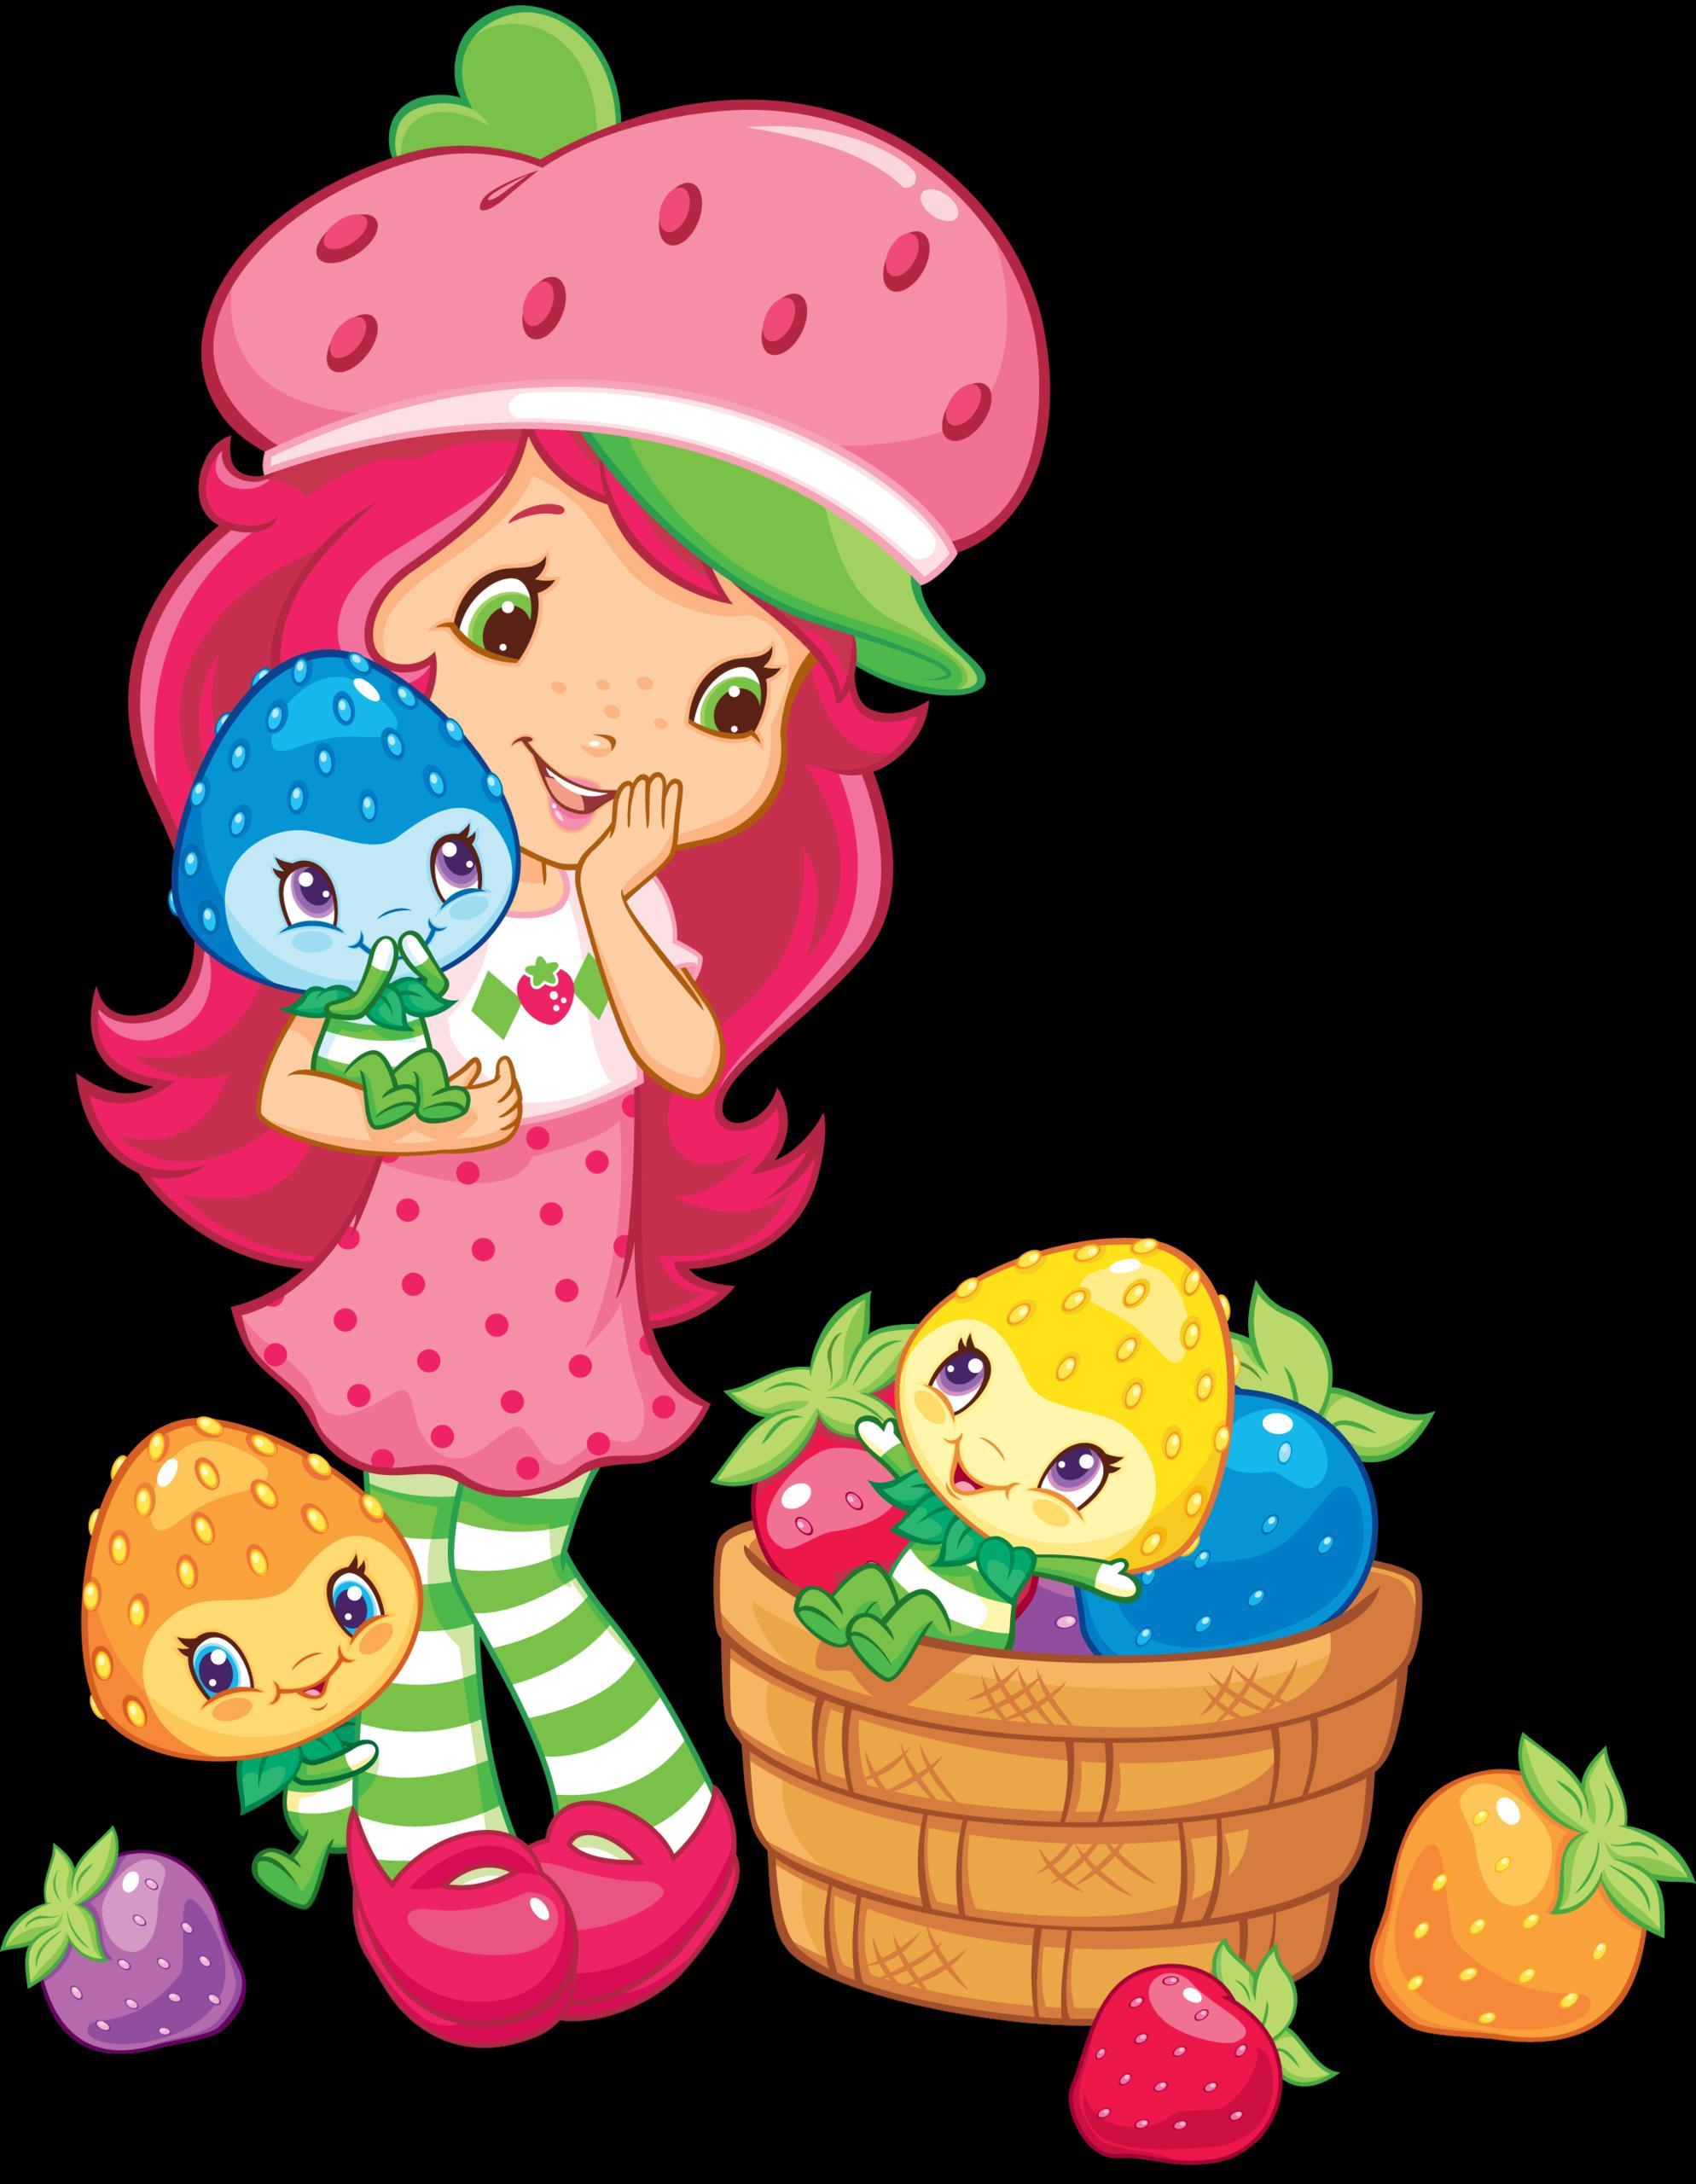 strawberry shortcake backgrounds wallpaper